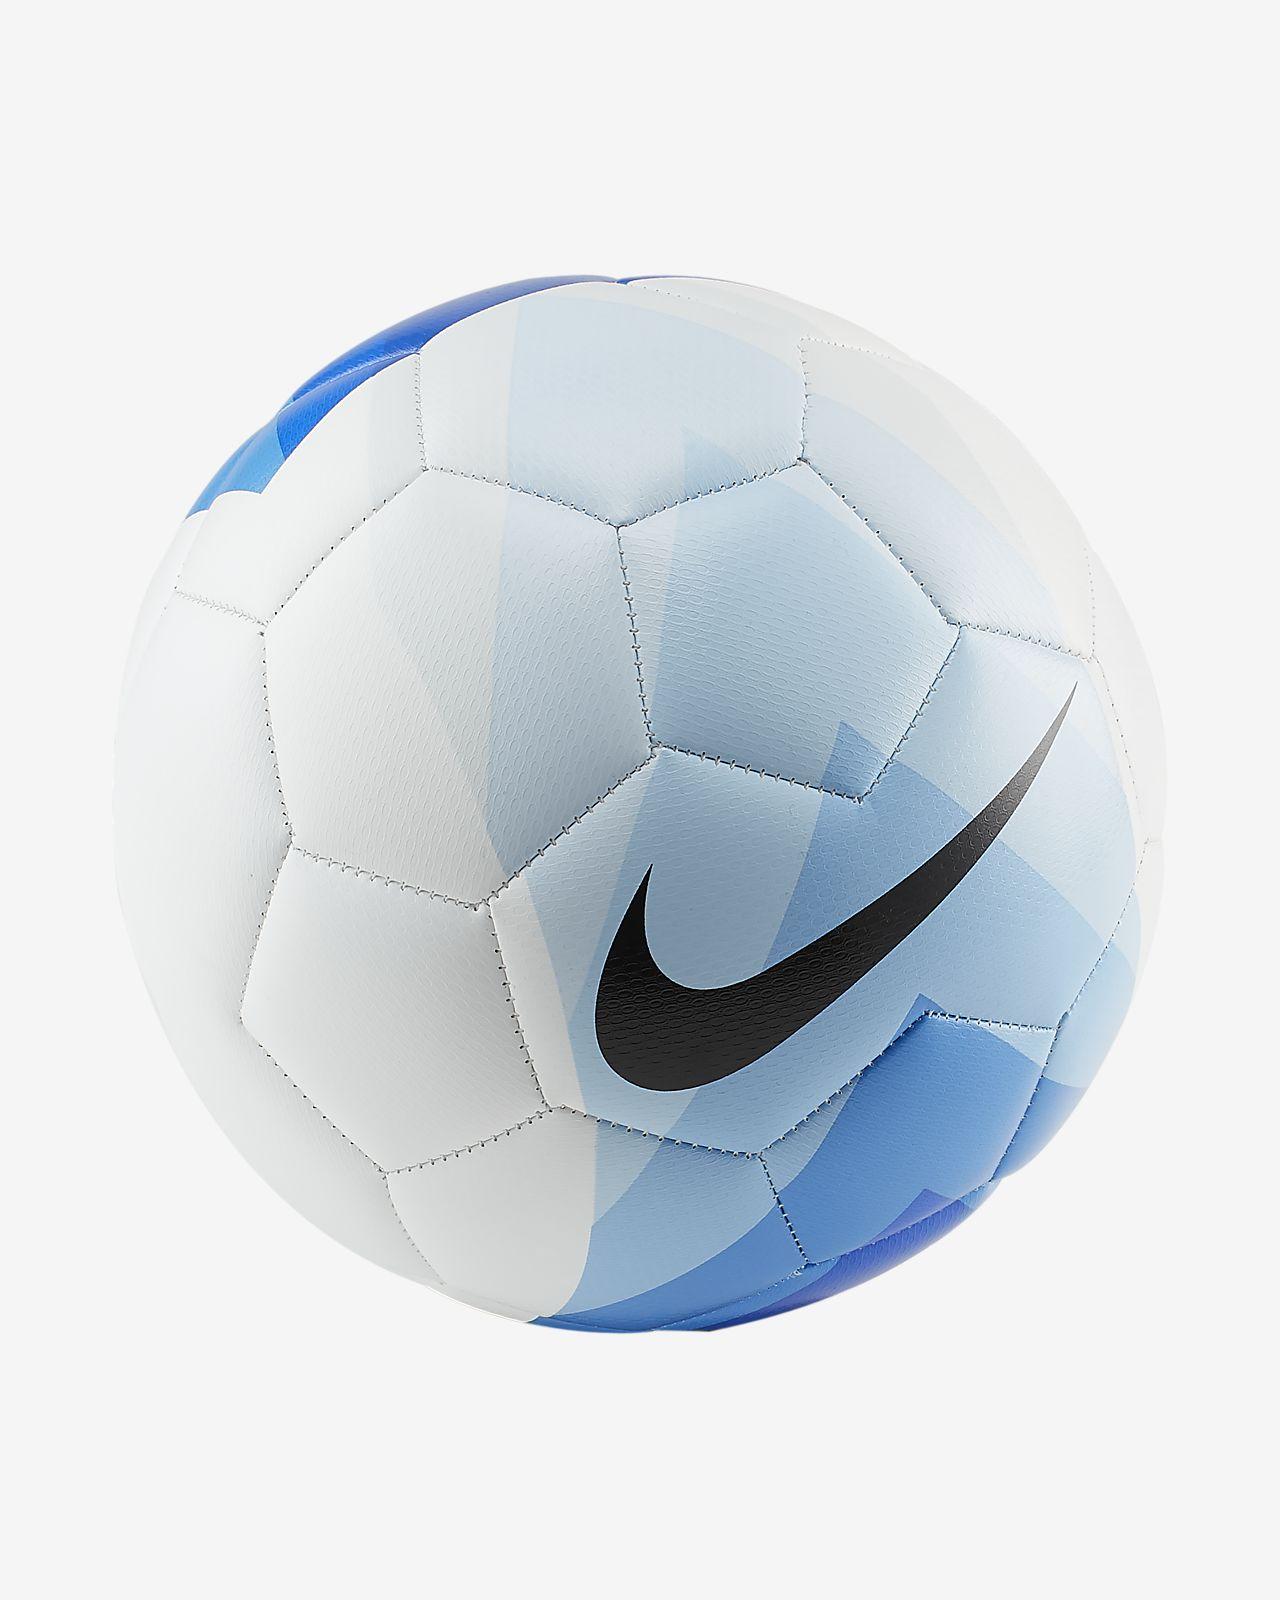 ef279e537 NikeFootballX Strike Football. Nike.com DK